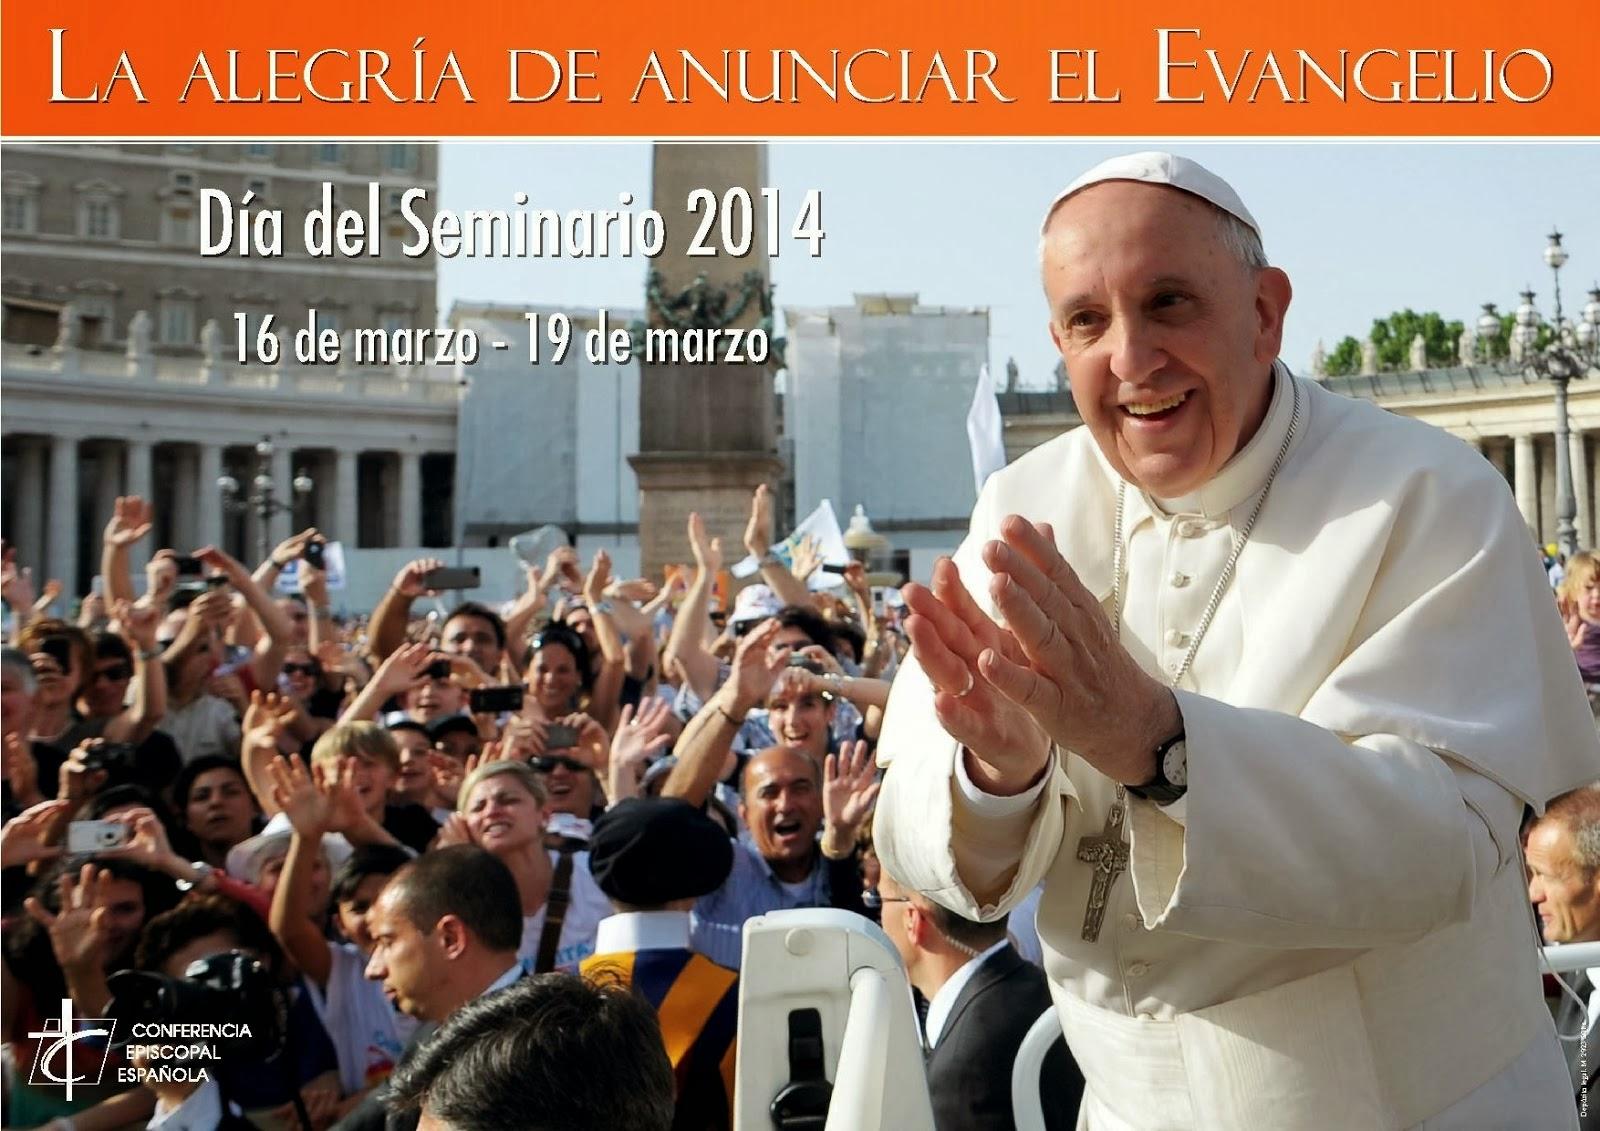 http://www.conferenciaepiscopal.es/index.php/dia-seminario.html